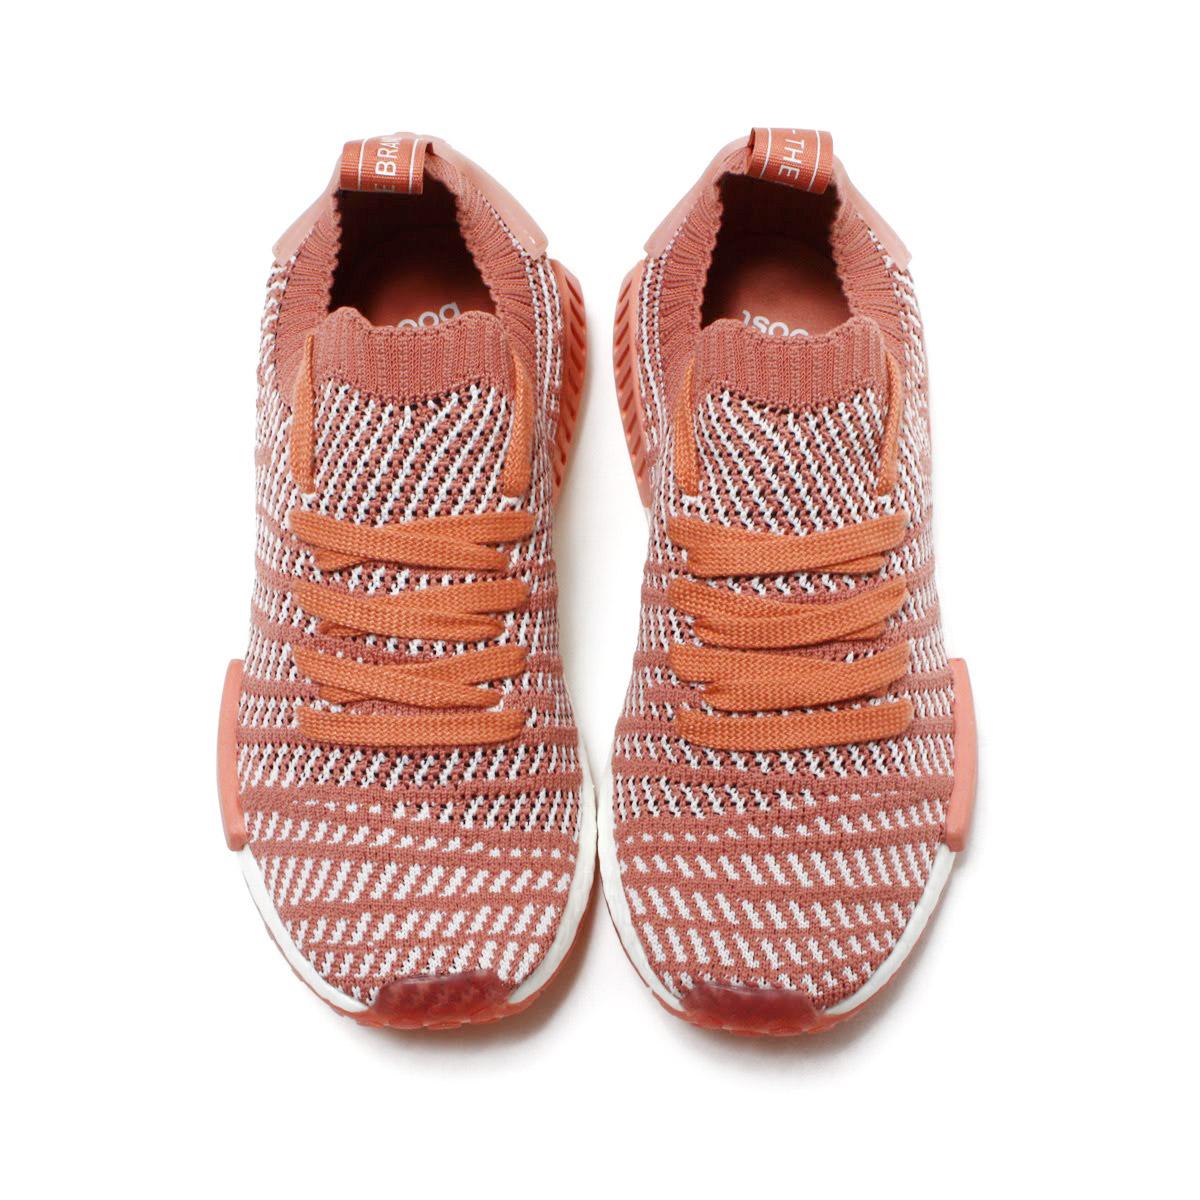 3afd4a9219f4e adidas Originals NMD R1 STLT PK W (아디다스오리지나르스에누엠디 R1 STLT PK W) Ash Pink Orchid  Tint Running White 18 SP-S